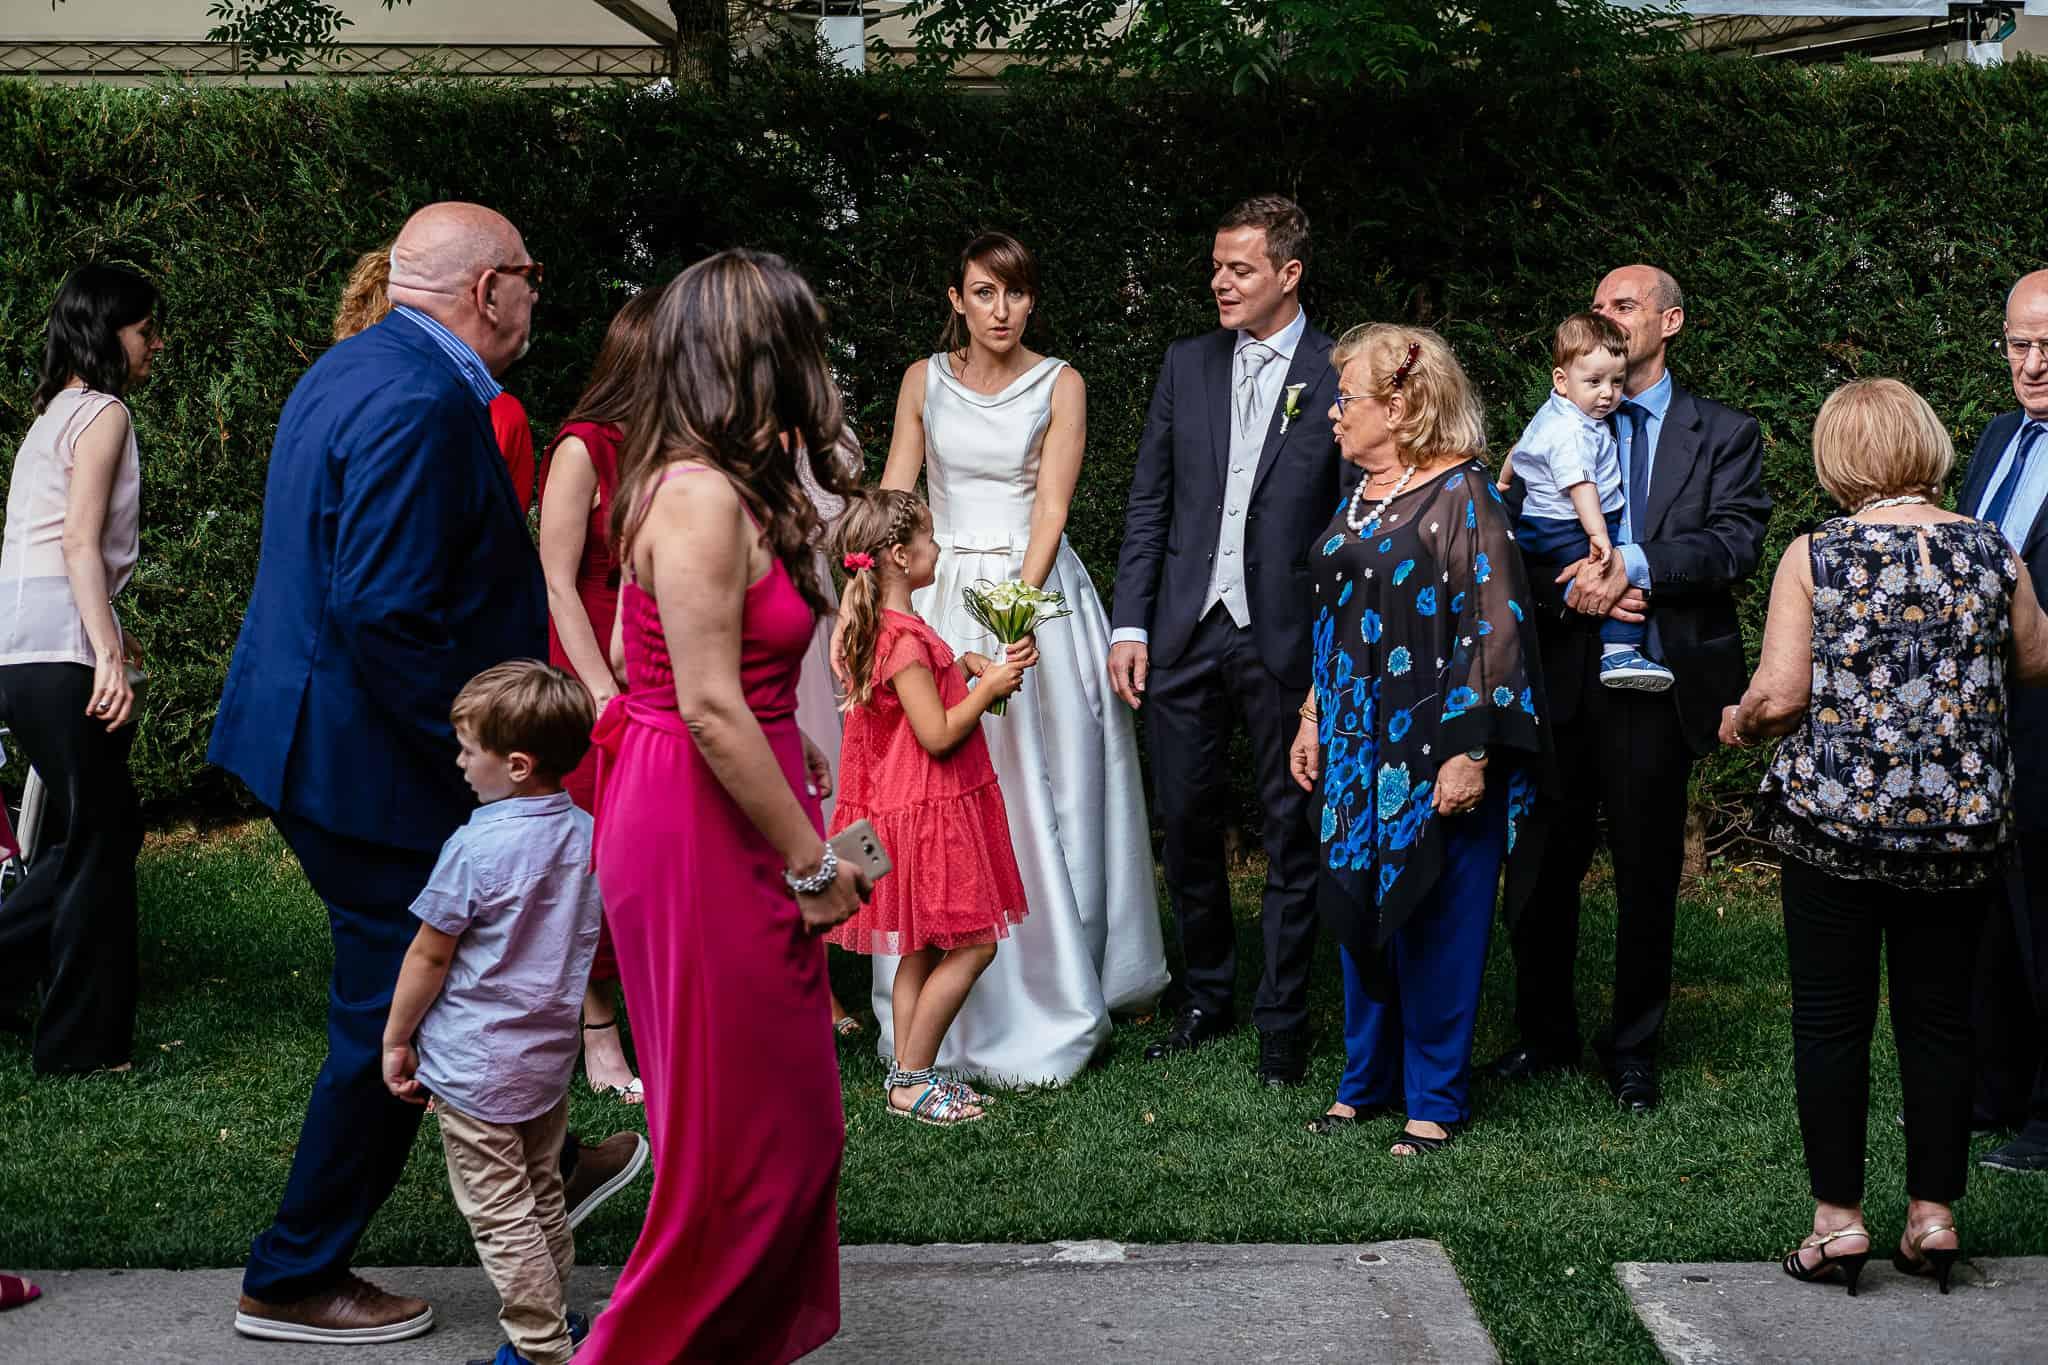 matrimonio Canter Milano San siro Luca rossi wedding reportage 0049